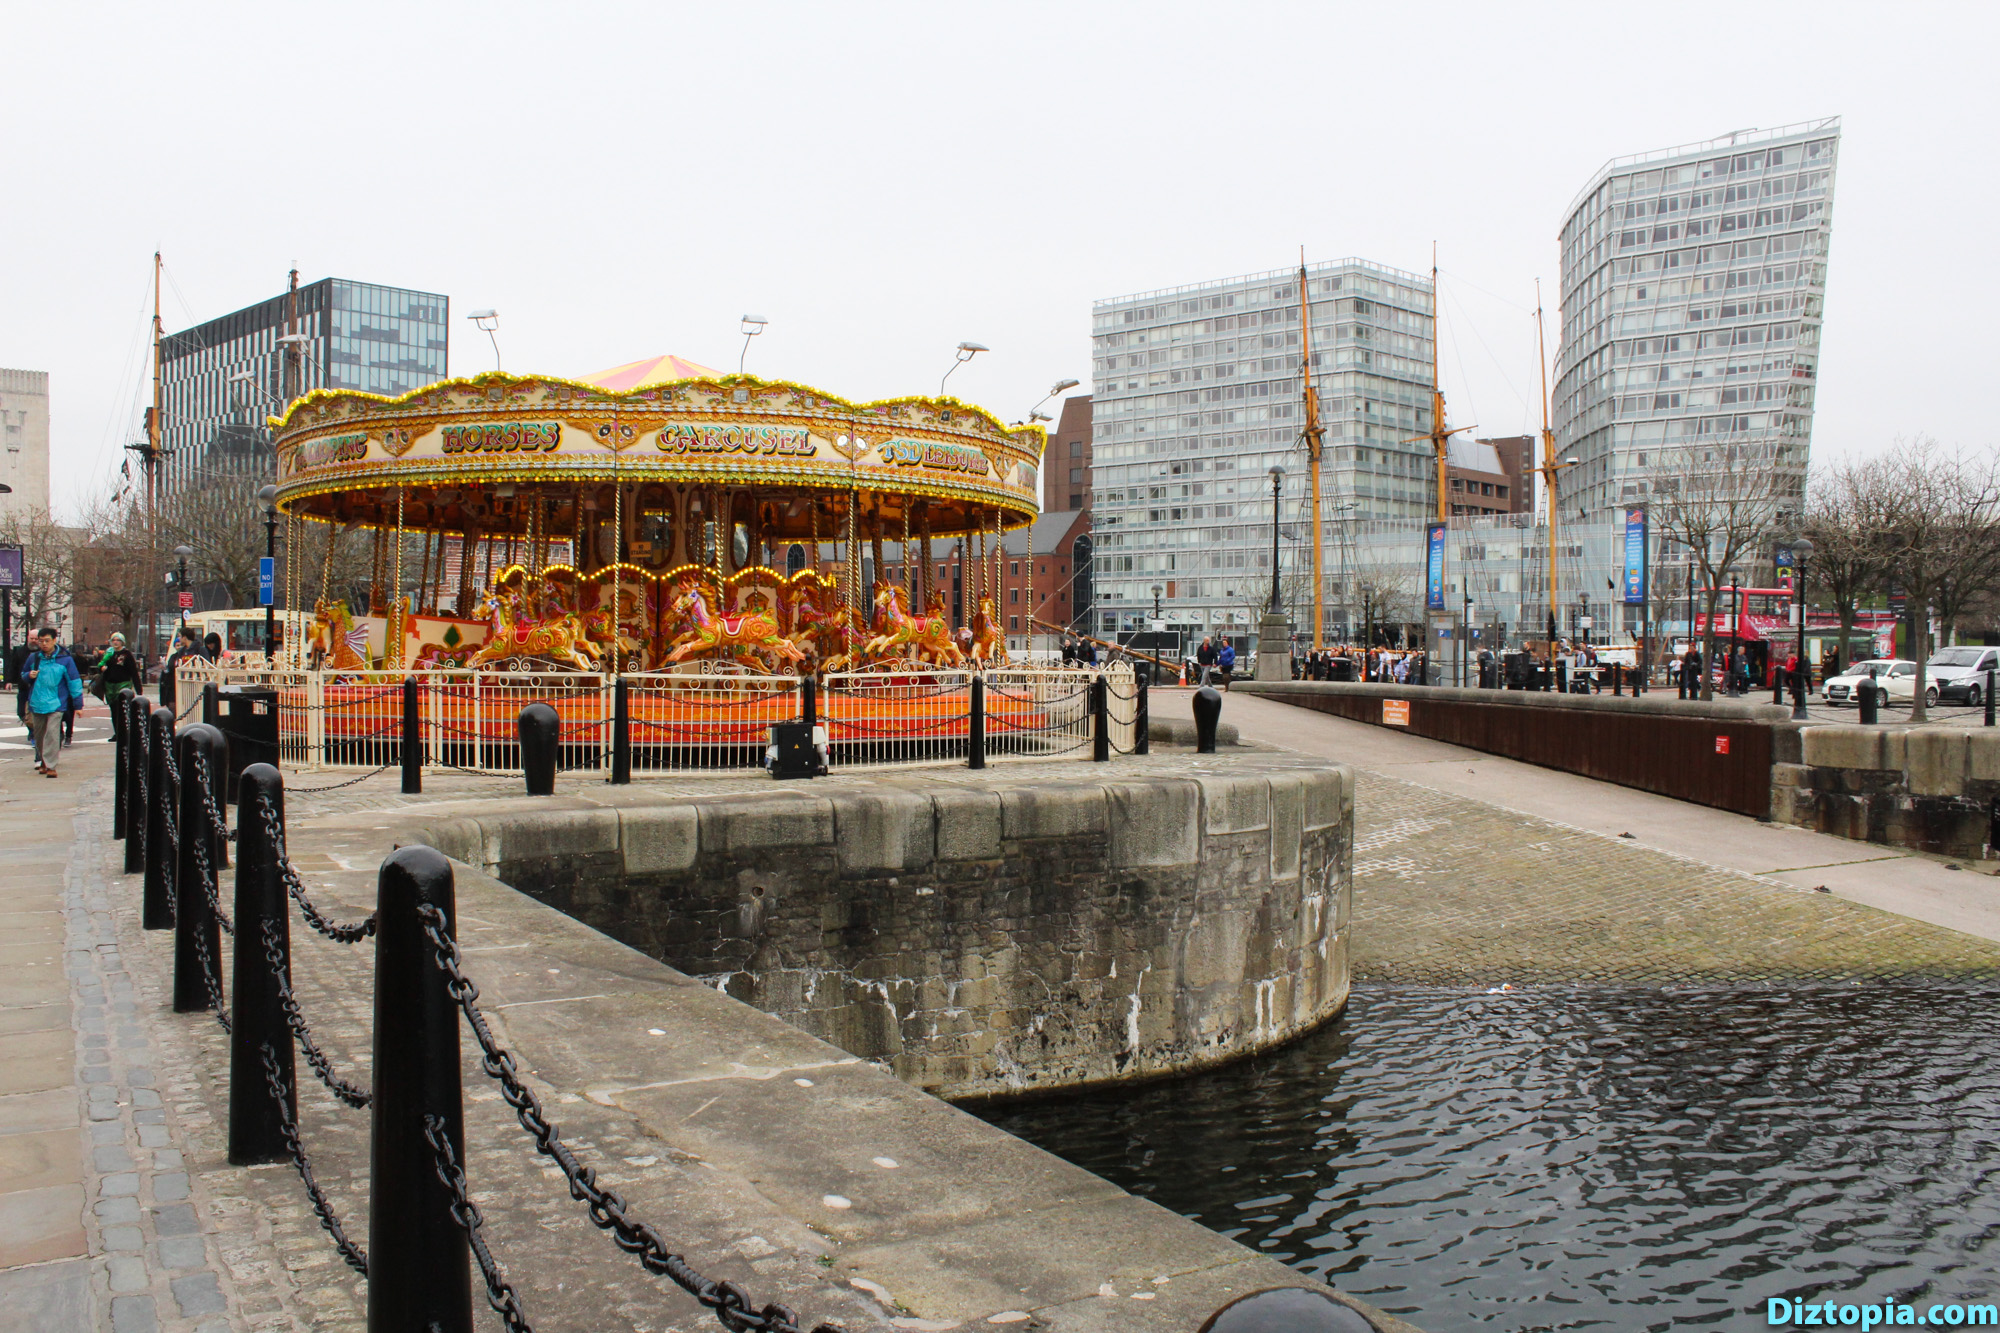 Liverpool-City-UK-Diztopia-Dizma-Dahl-Photography-2017-06-Albert-Dock-Queens-Wapping-Salthouse-Canning-Coburg-Dukes